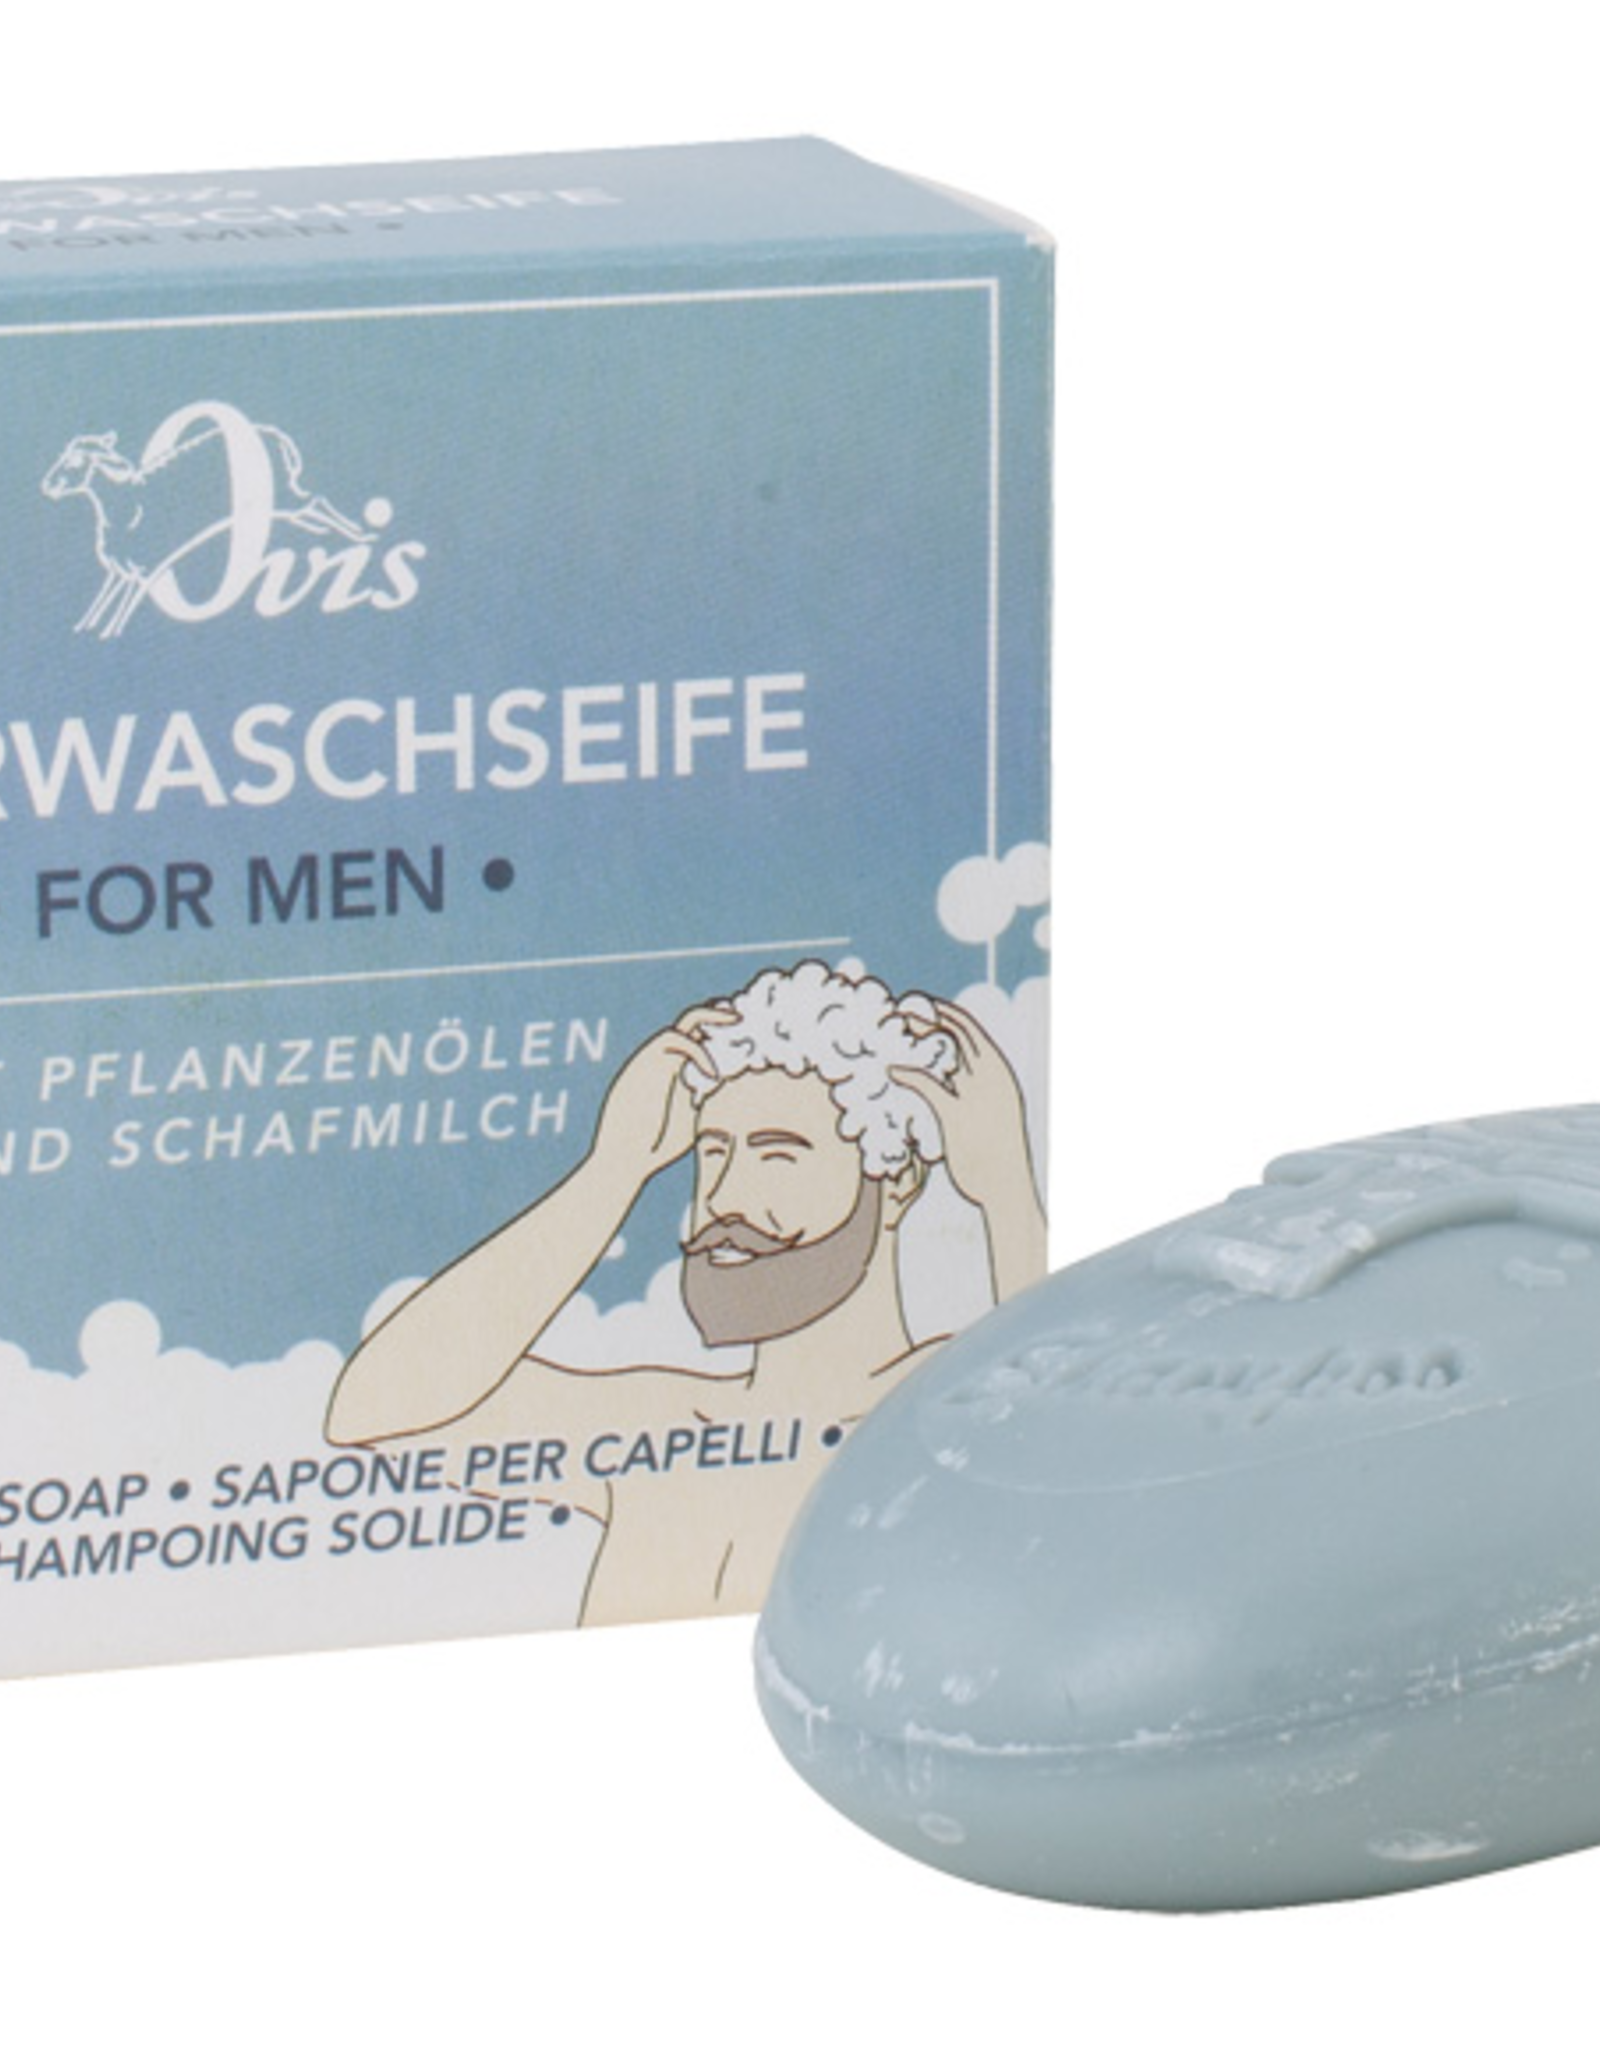 Shampoo Soap Bar for Men